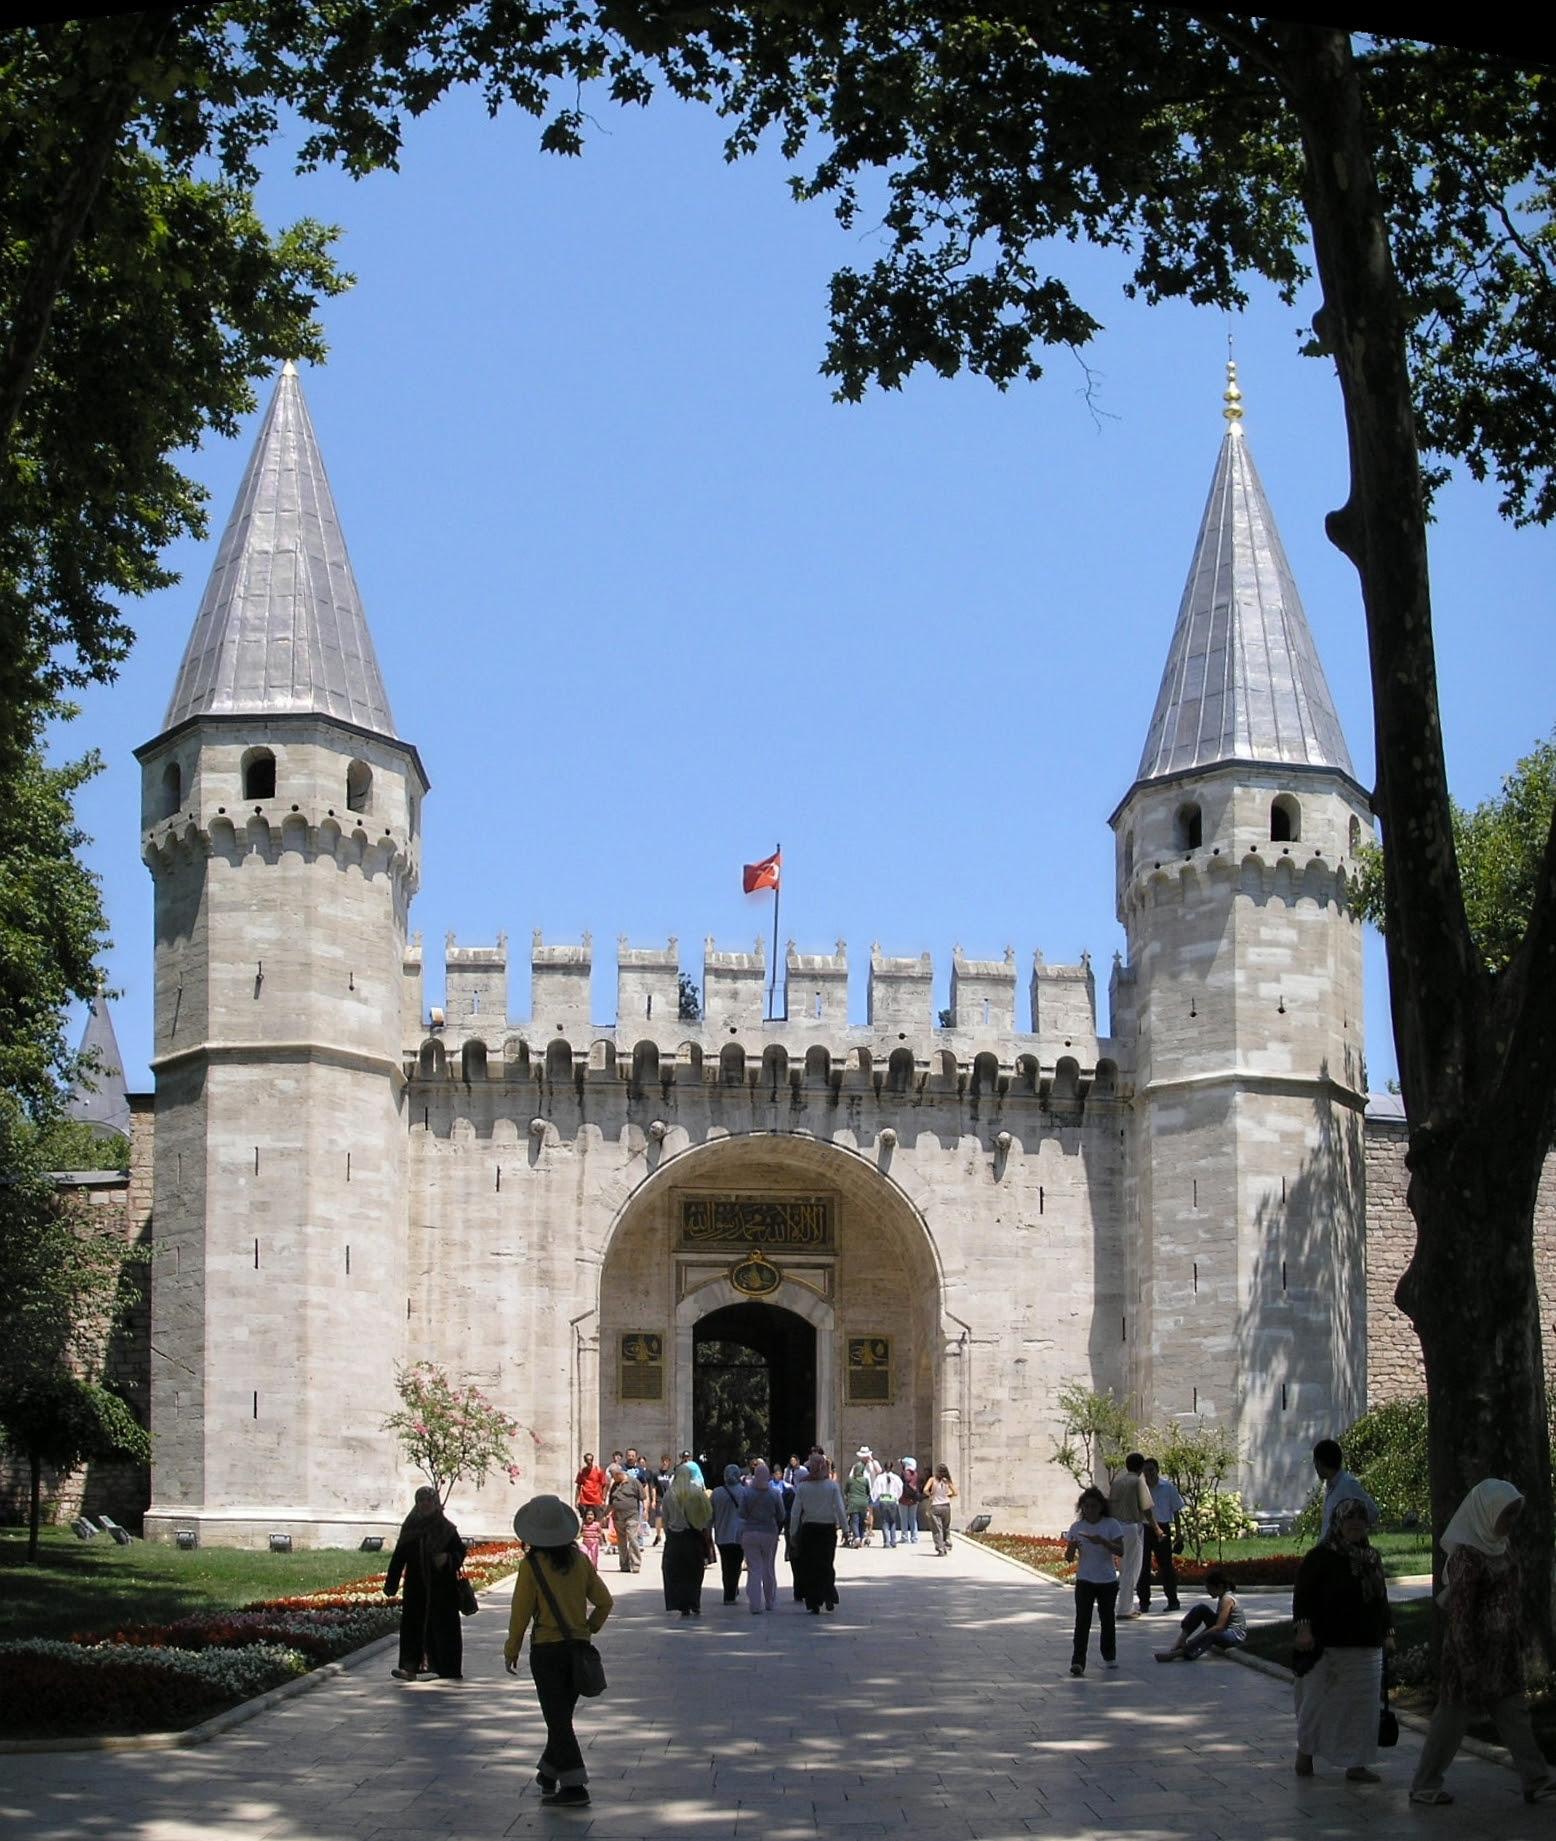 The Gate of Salutation, Topkapi Palace, Constantinople